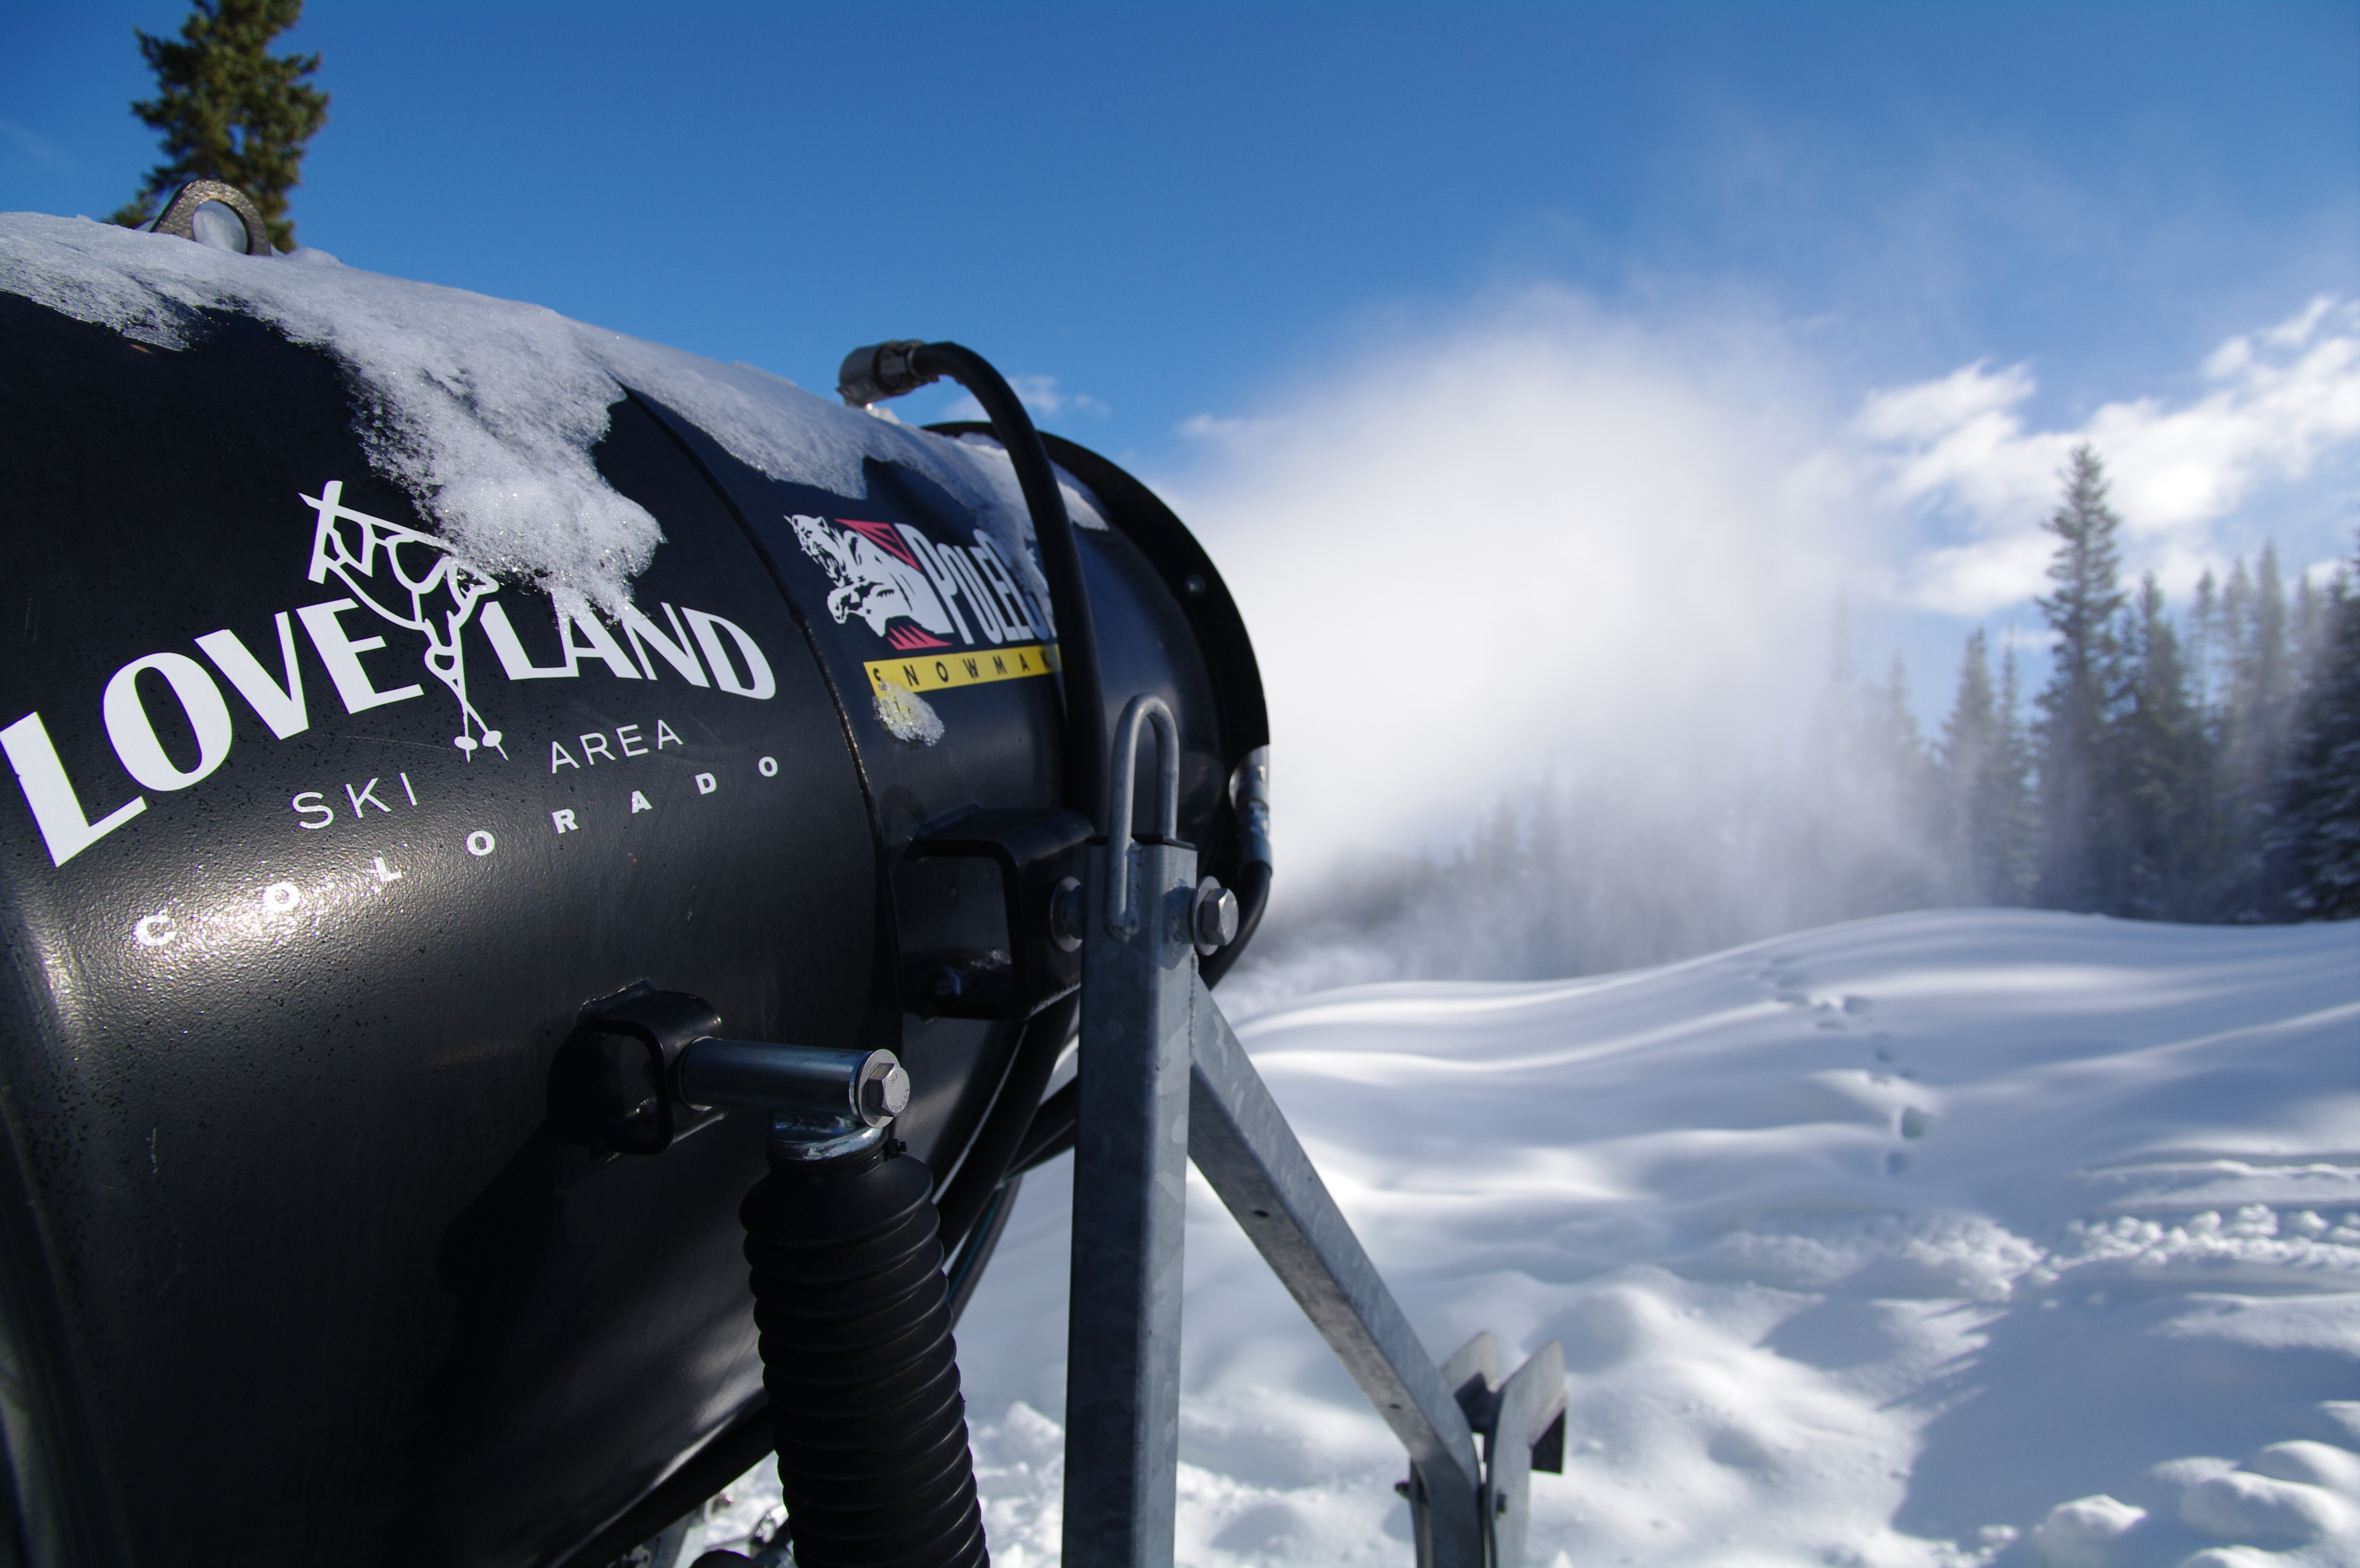 Loveland Ski Area Snow Guns